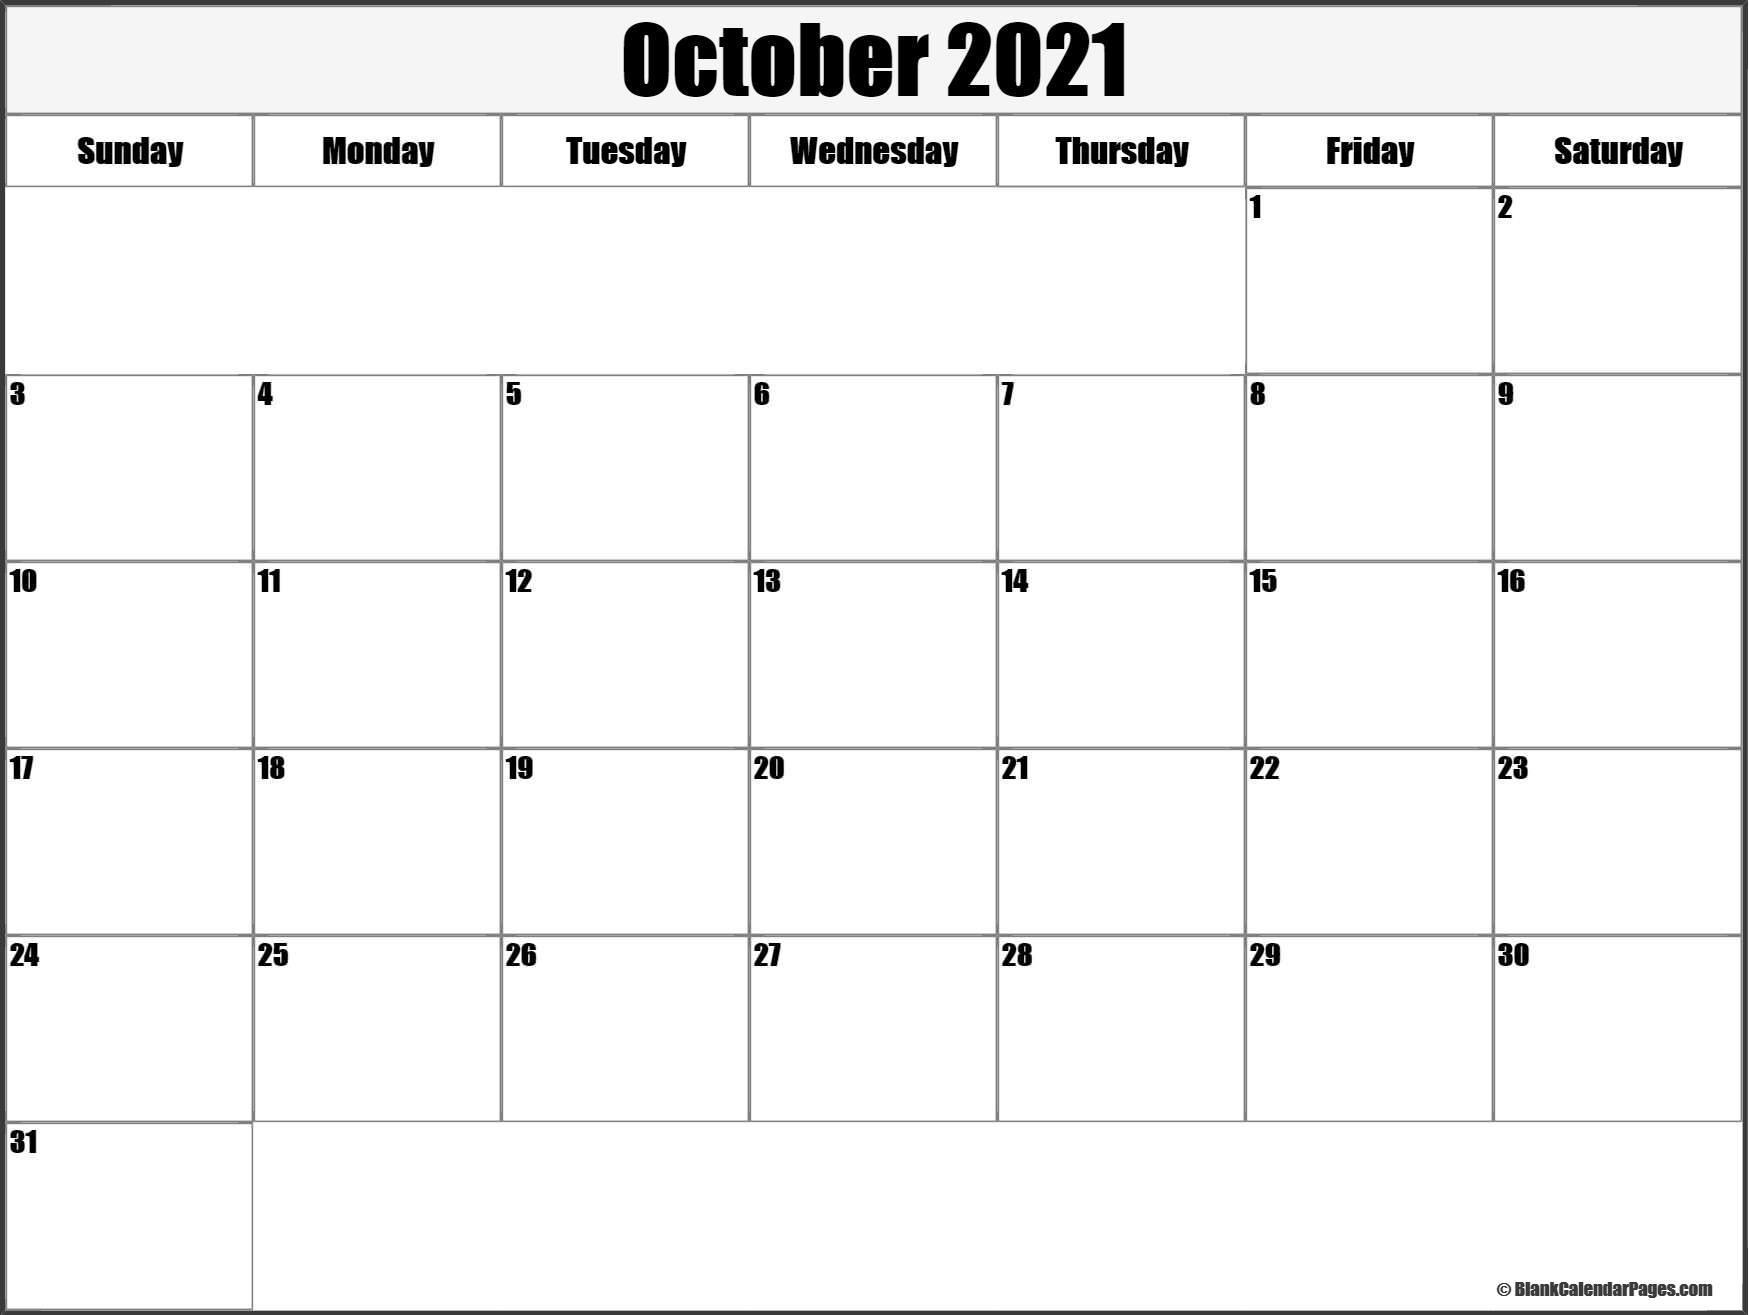 October 2021 Blank Calendar Templates.